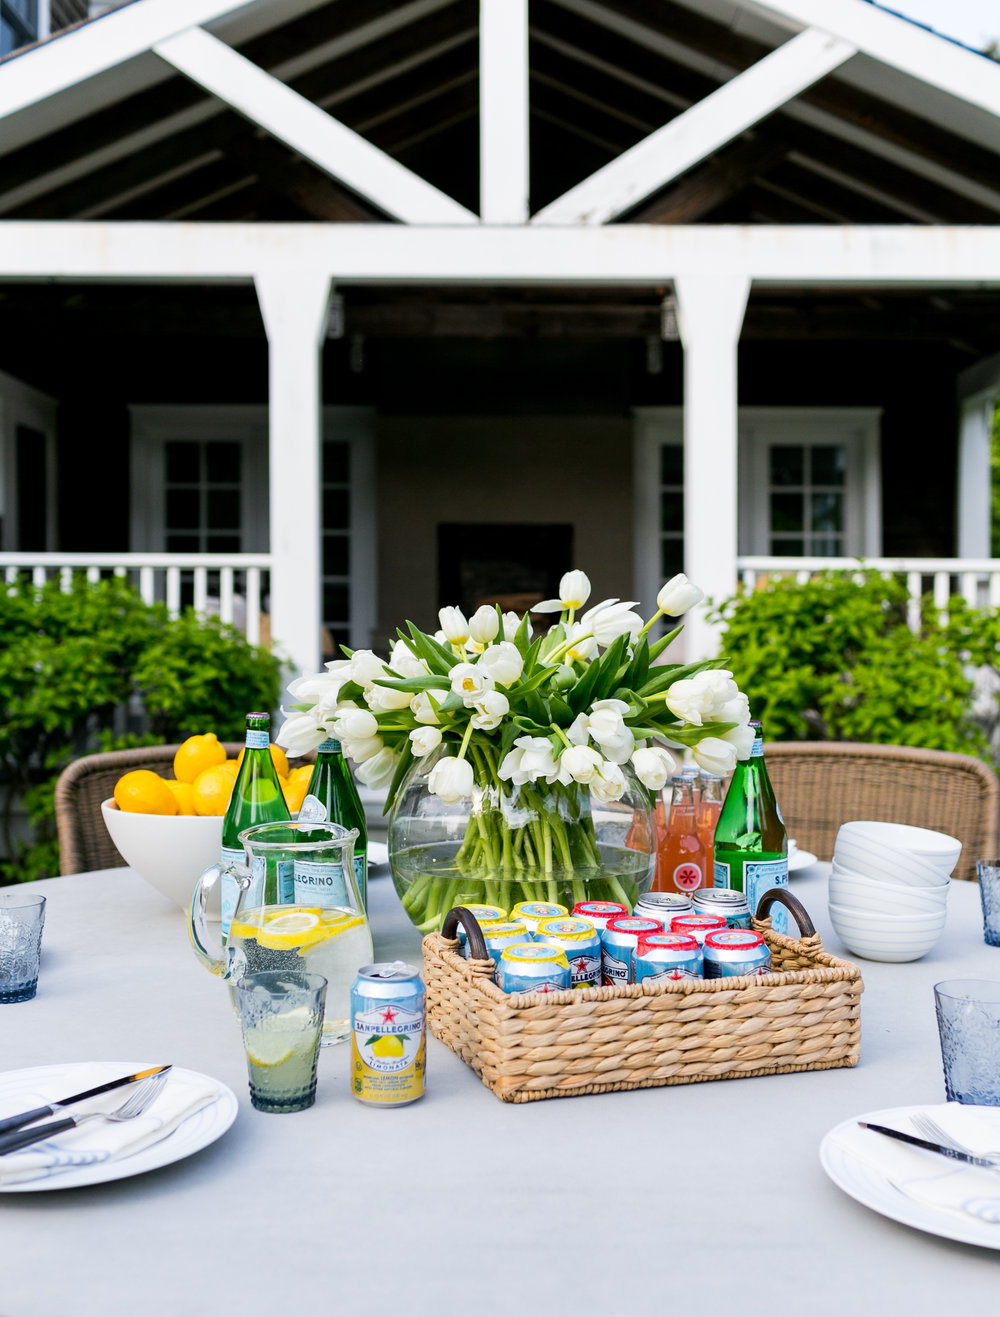 House Tour-Run Away to This Beach House Beauty in the Hamptons 20.jpg